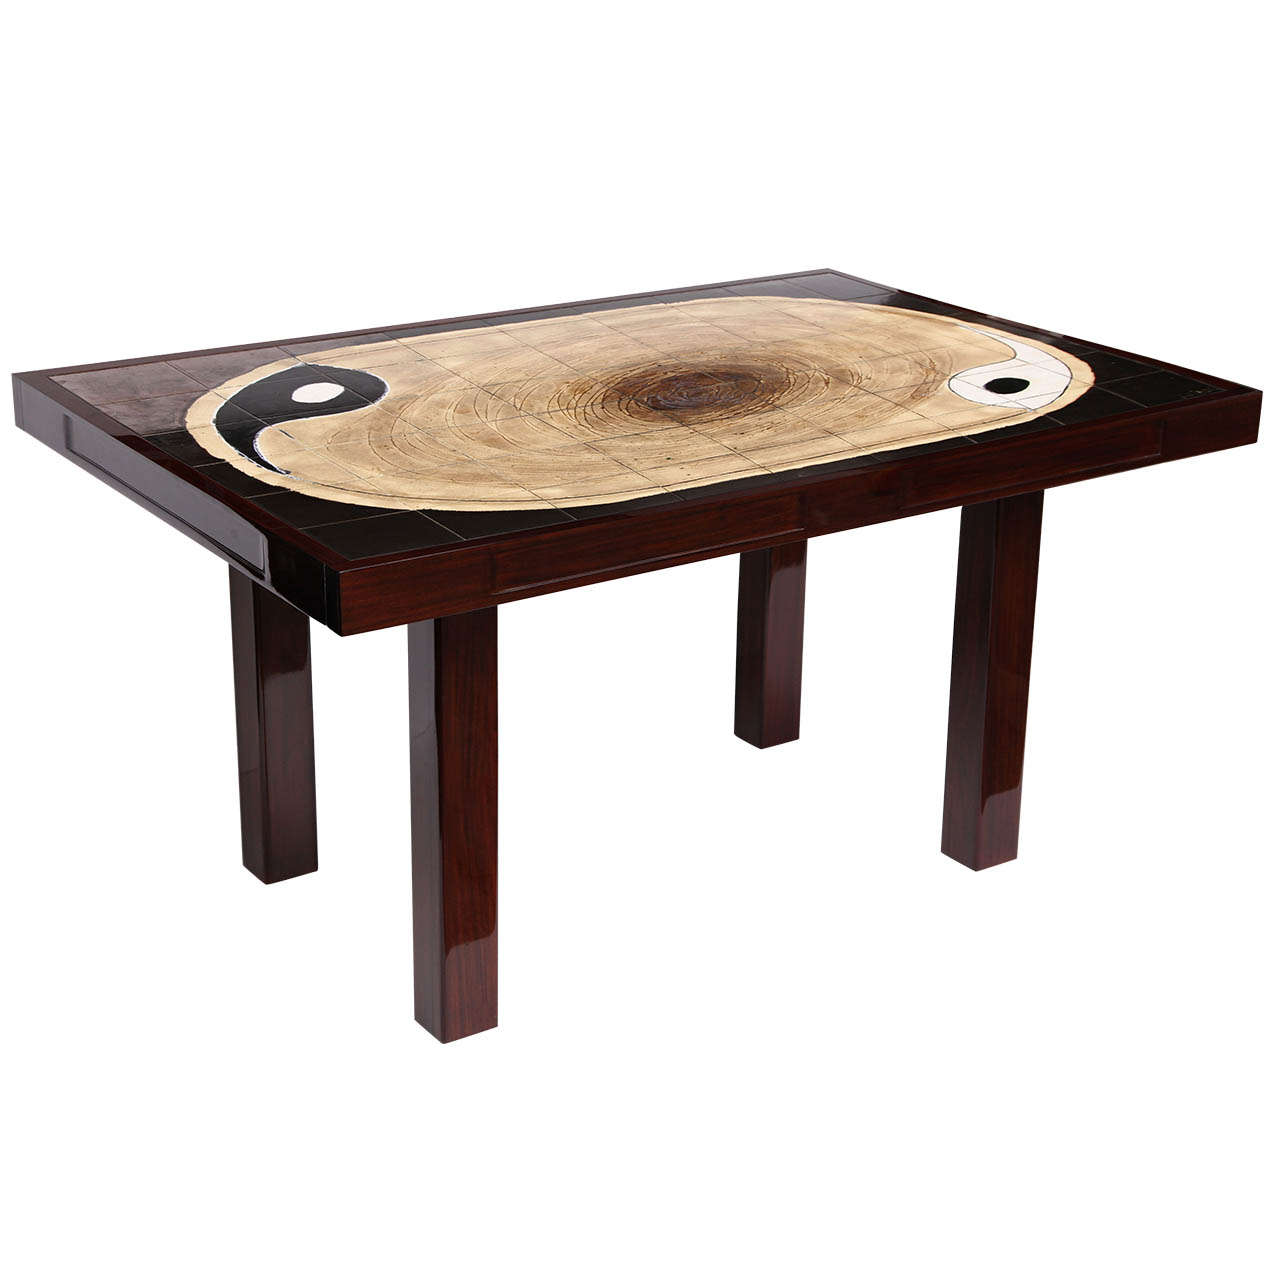 Yin yang ceramic tile top table at 1stdibs for Table yin yang basse